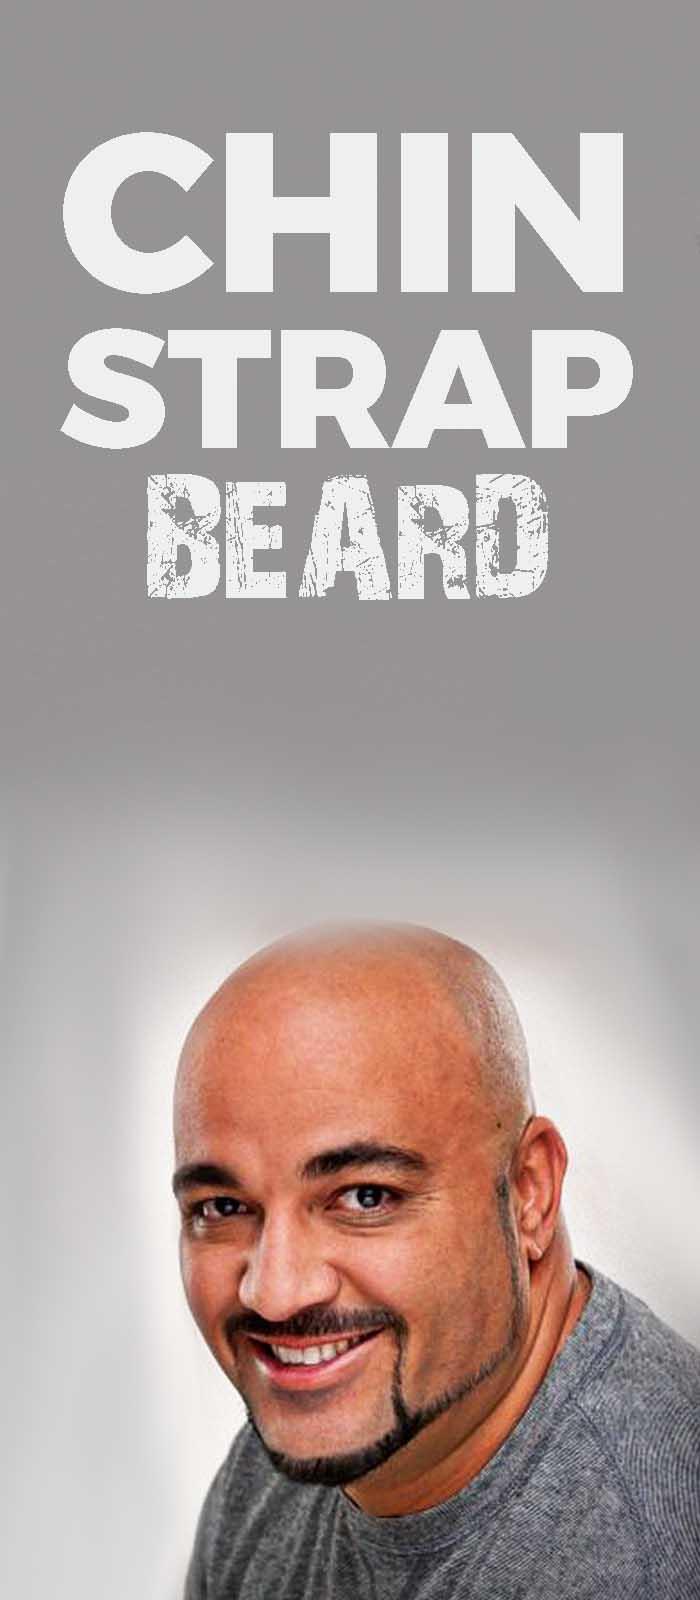 Chin Strip Beard Style.